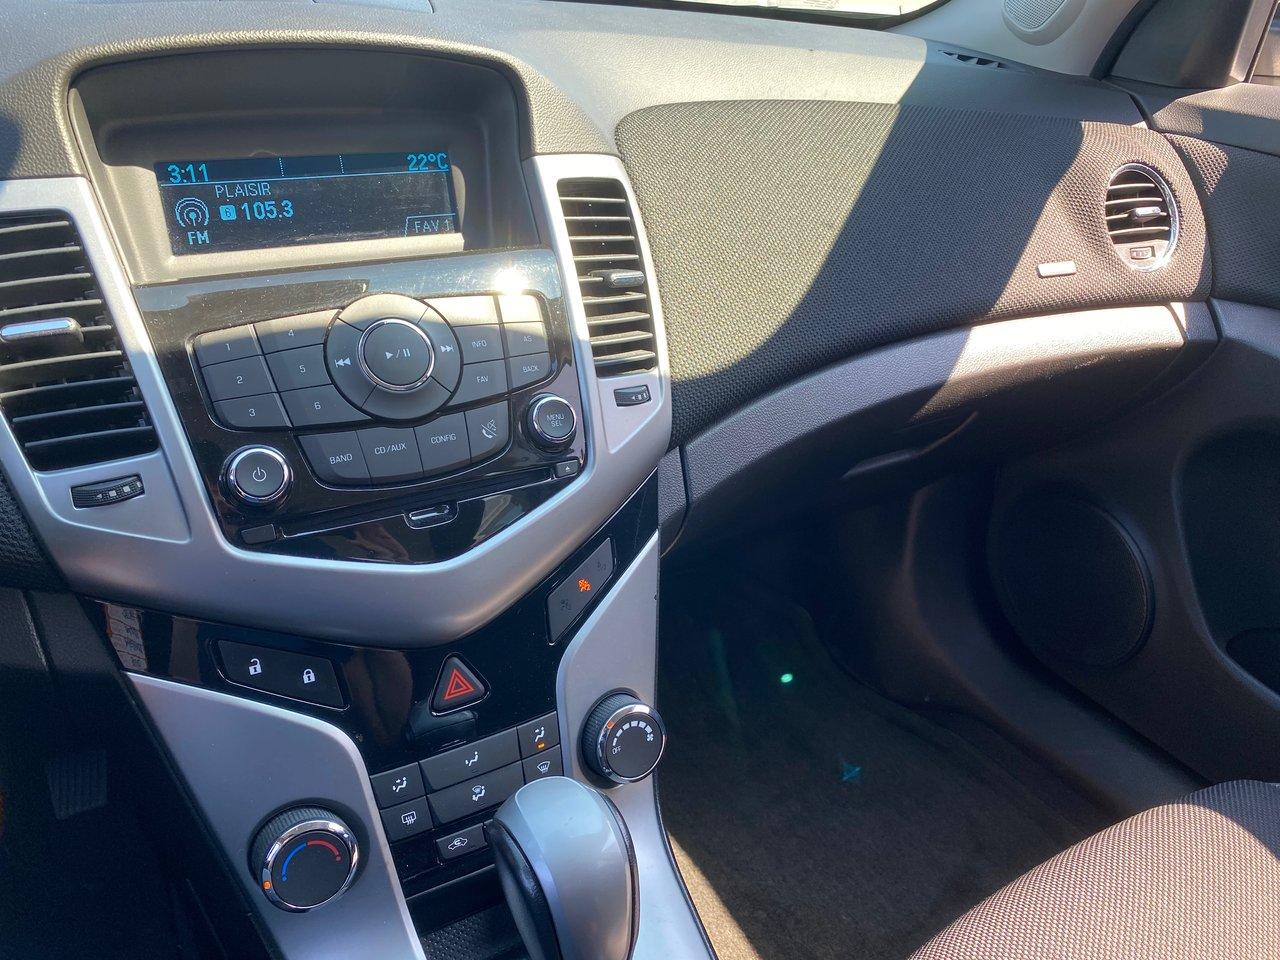 2013 Chevrolet Cruze LT Turbo